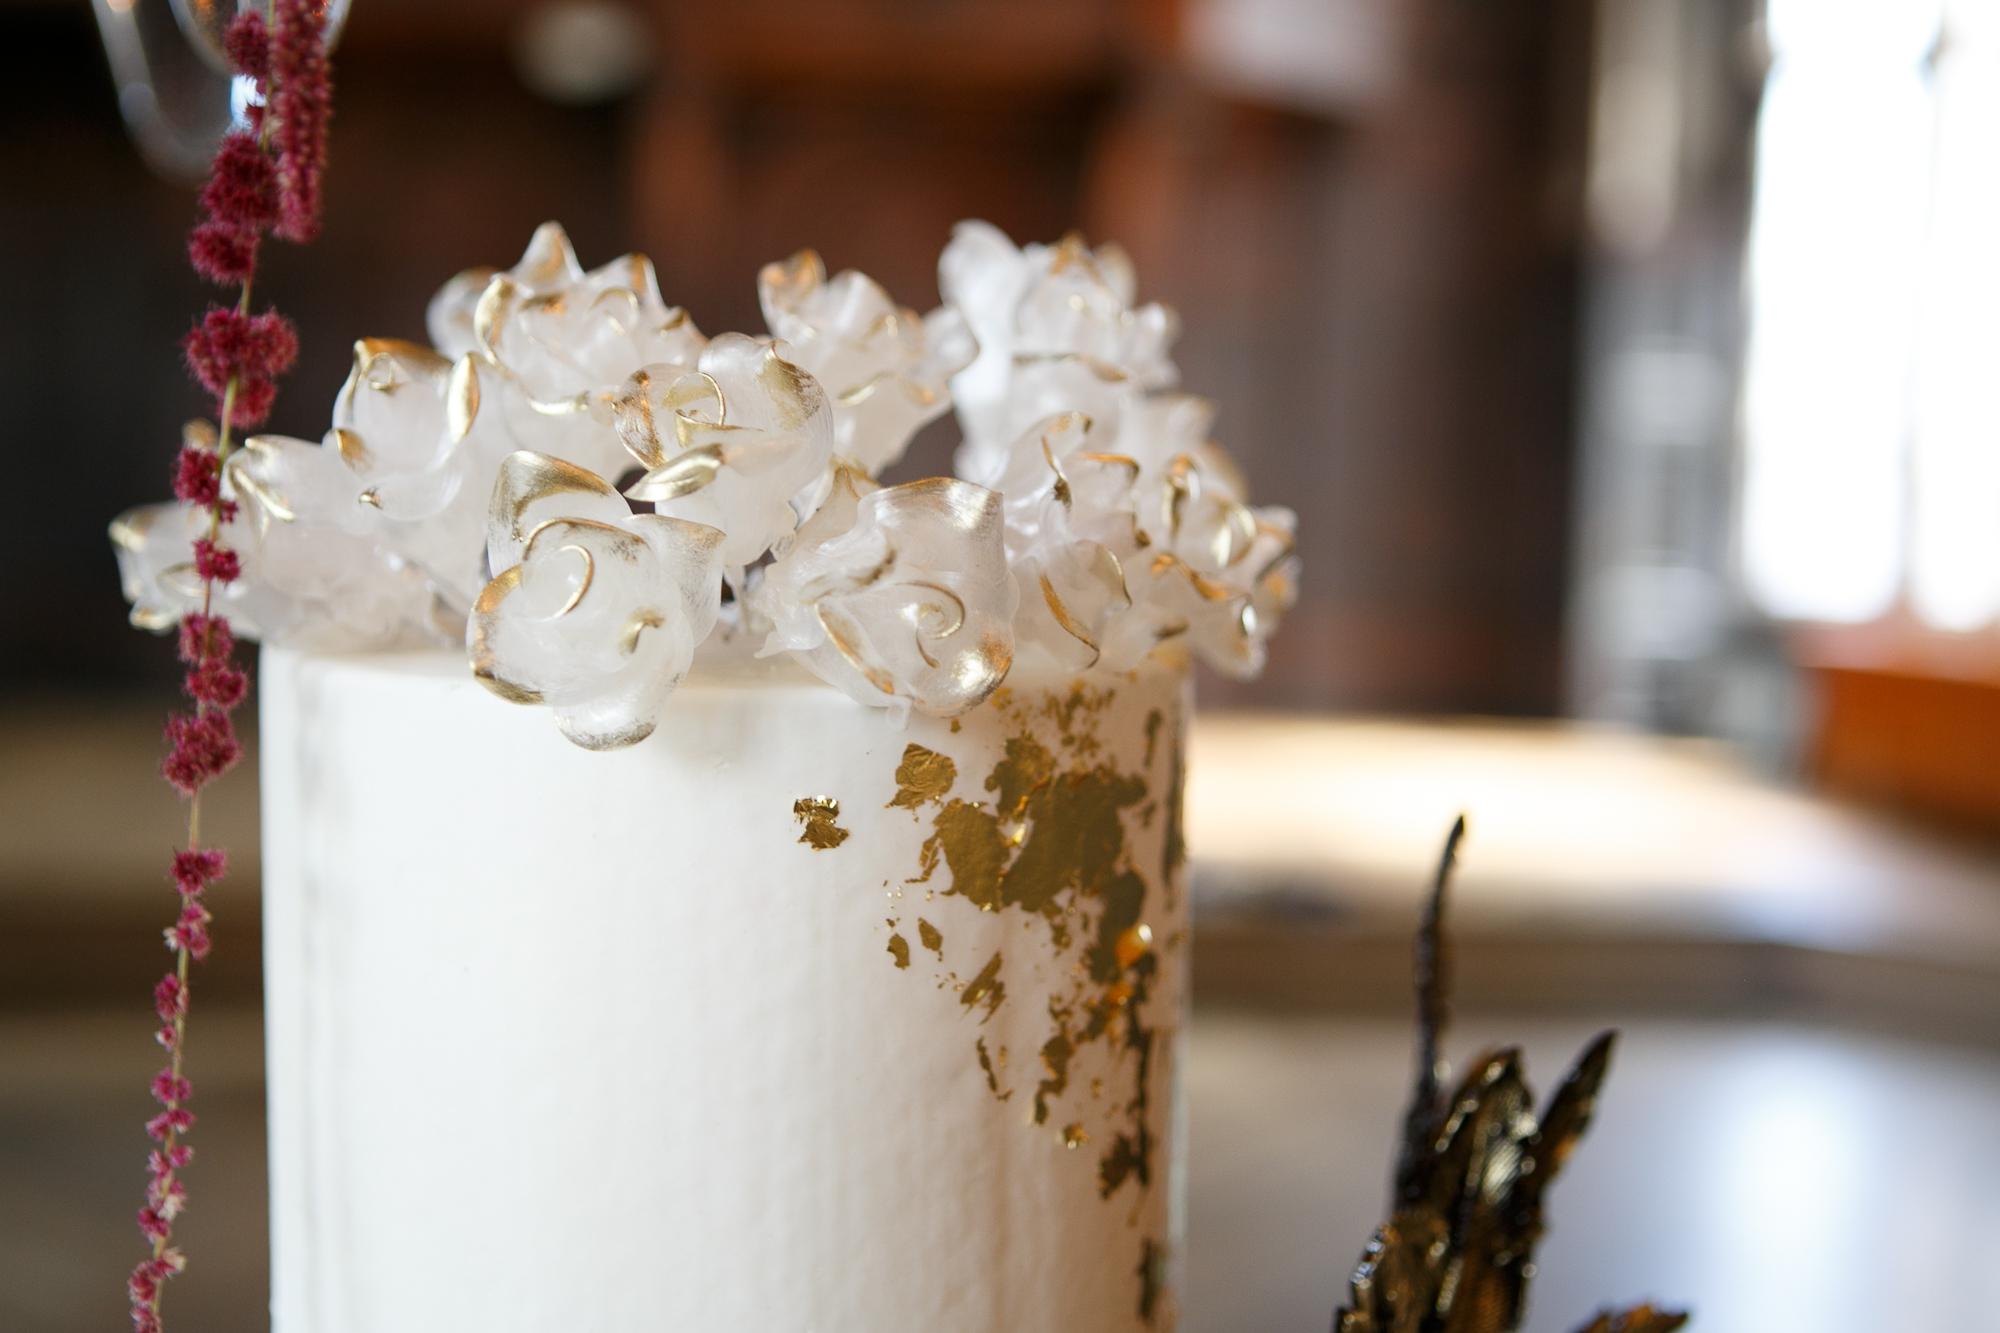 24 spun sugar gold tipped wedding cake evil queen wedding inspiration.jpg